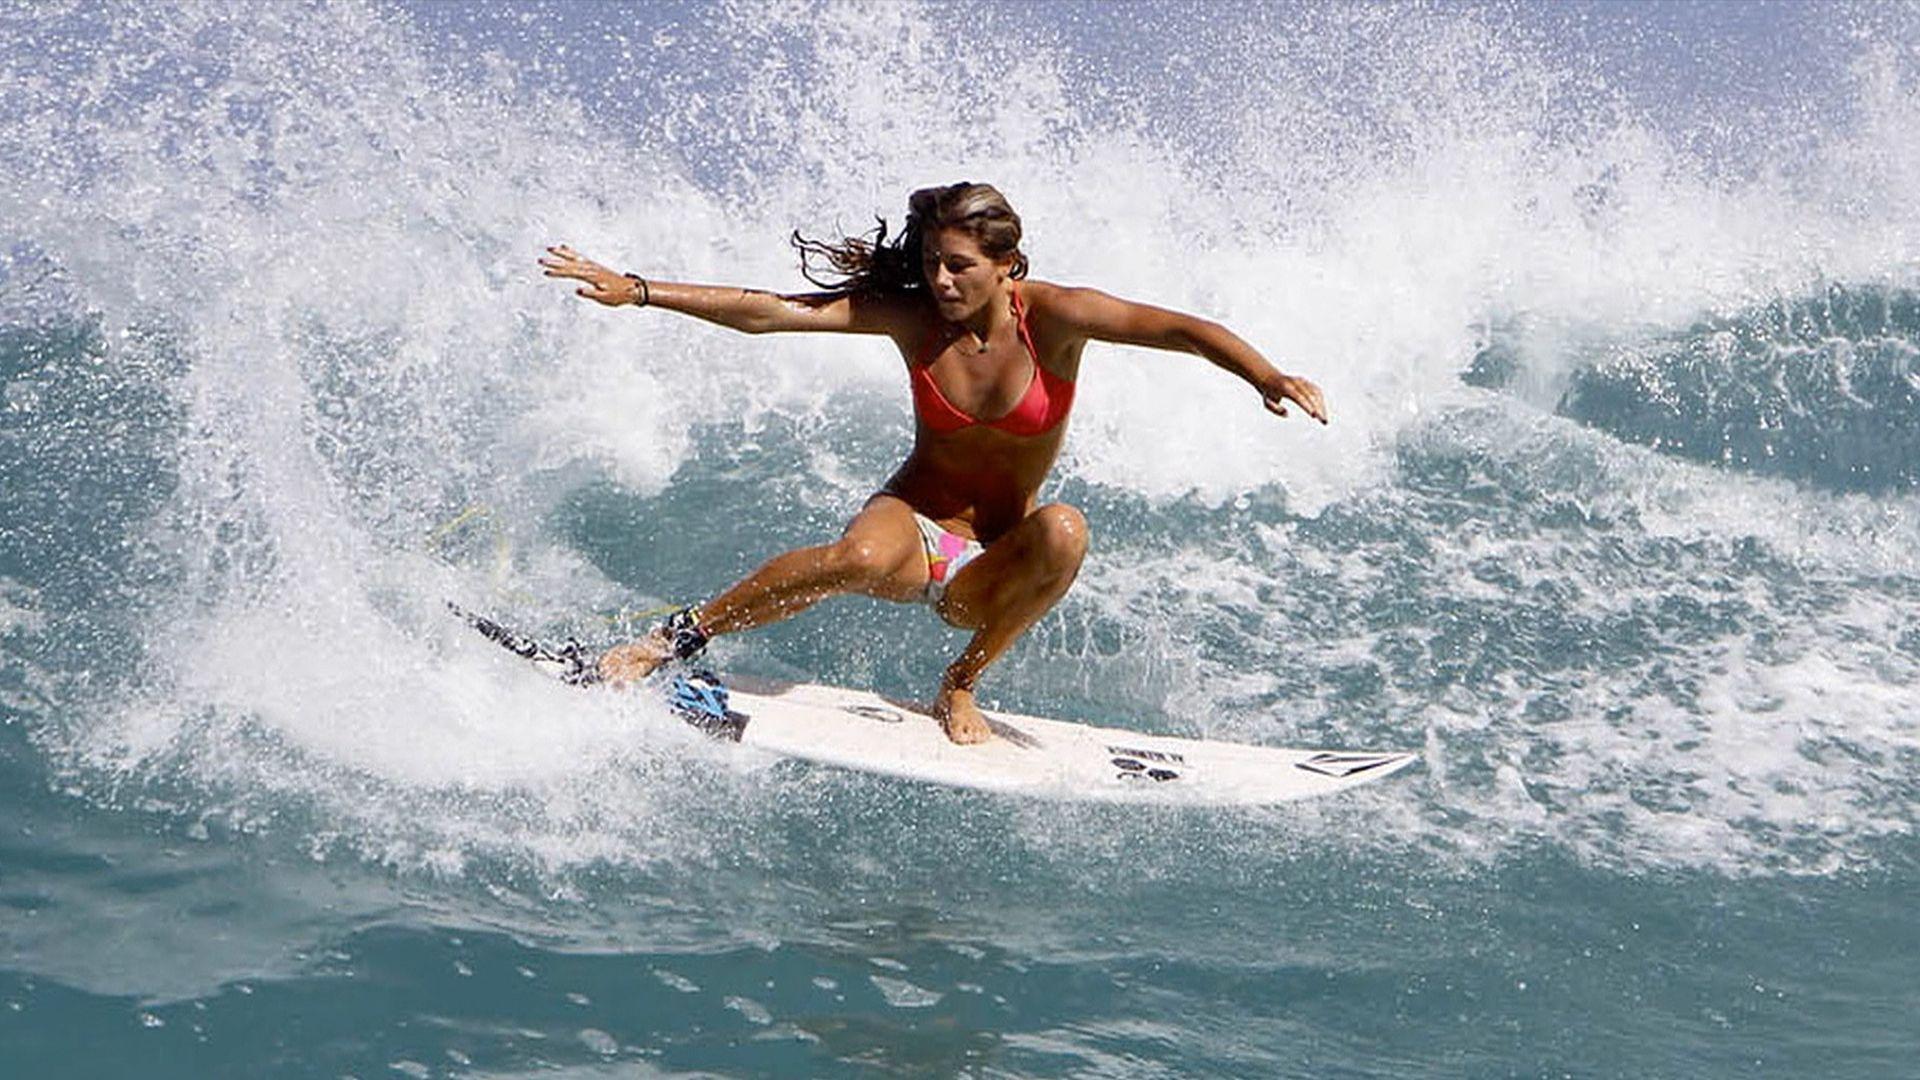 Female surfers